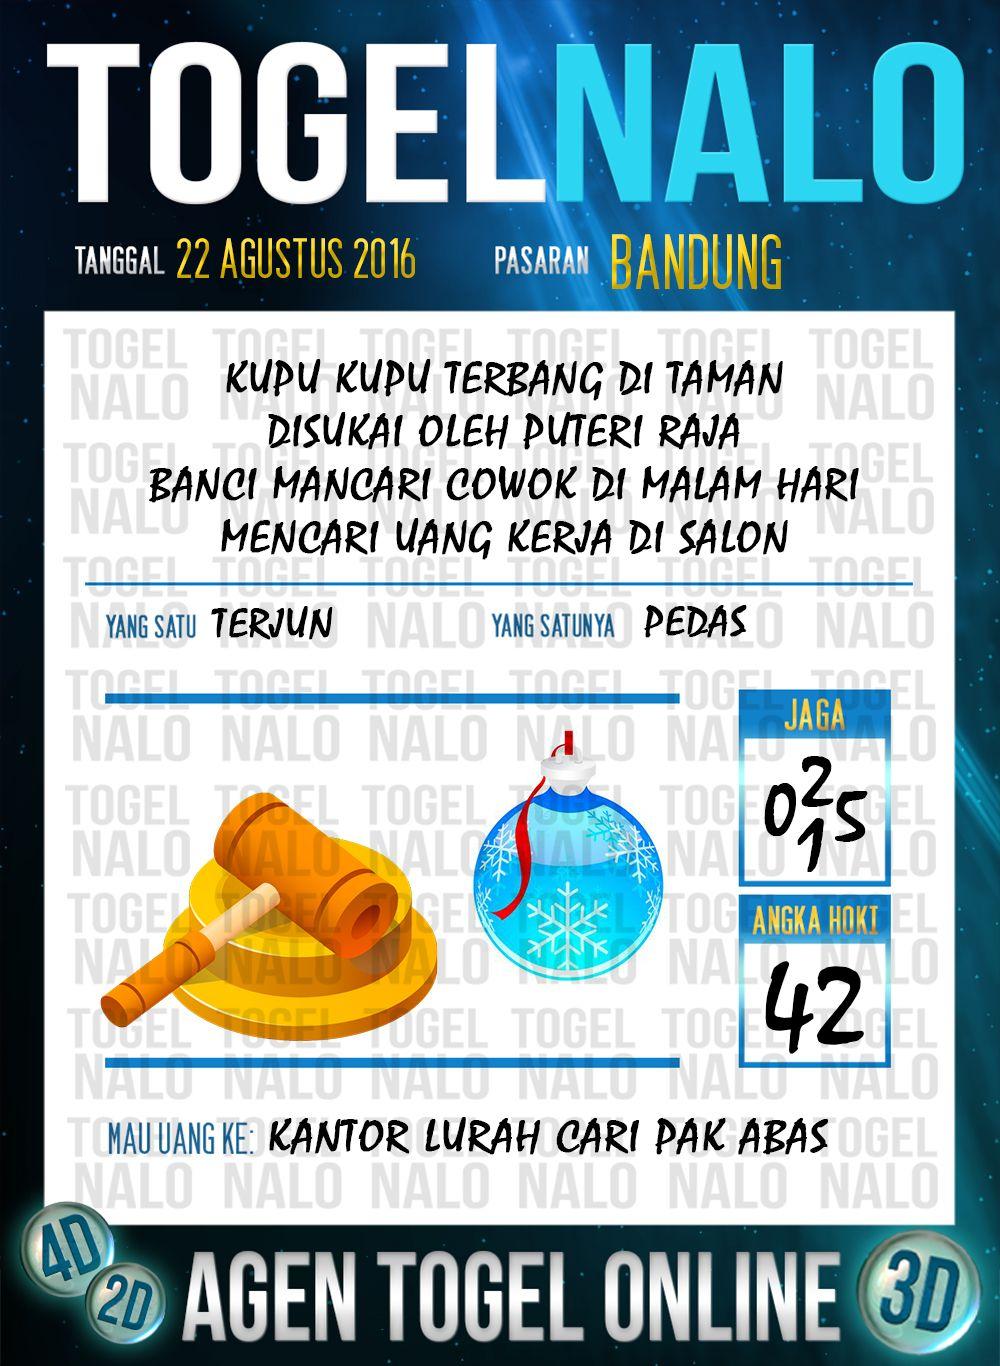 Prediksi Togel Online Live Draw 4D TogelNalo Bandung 22 Agustus 2016